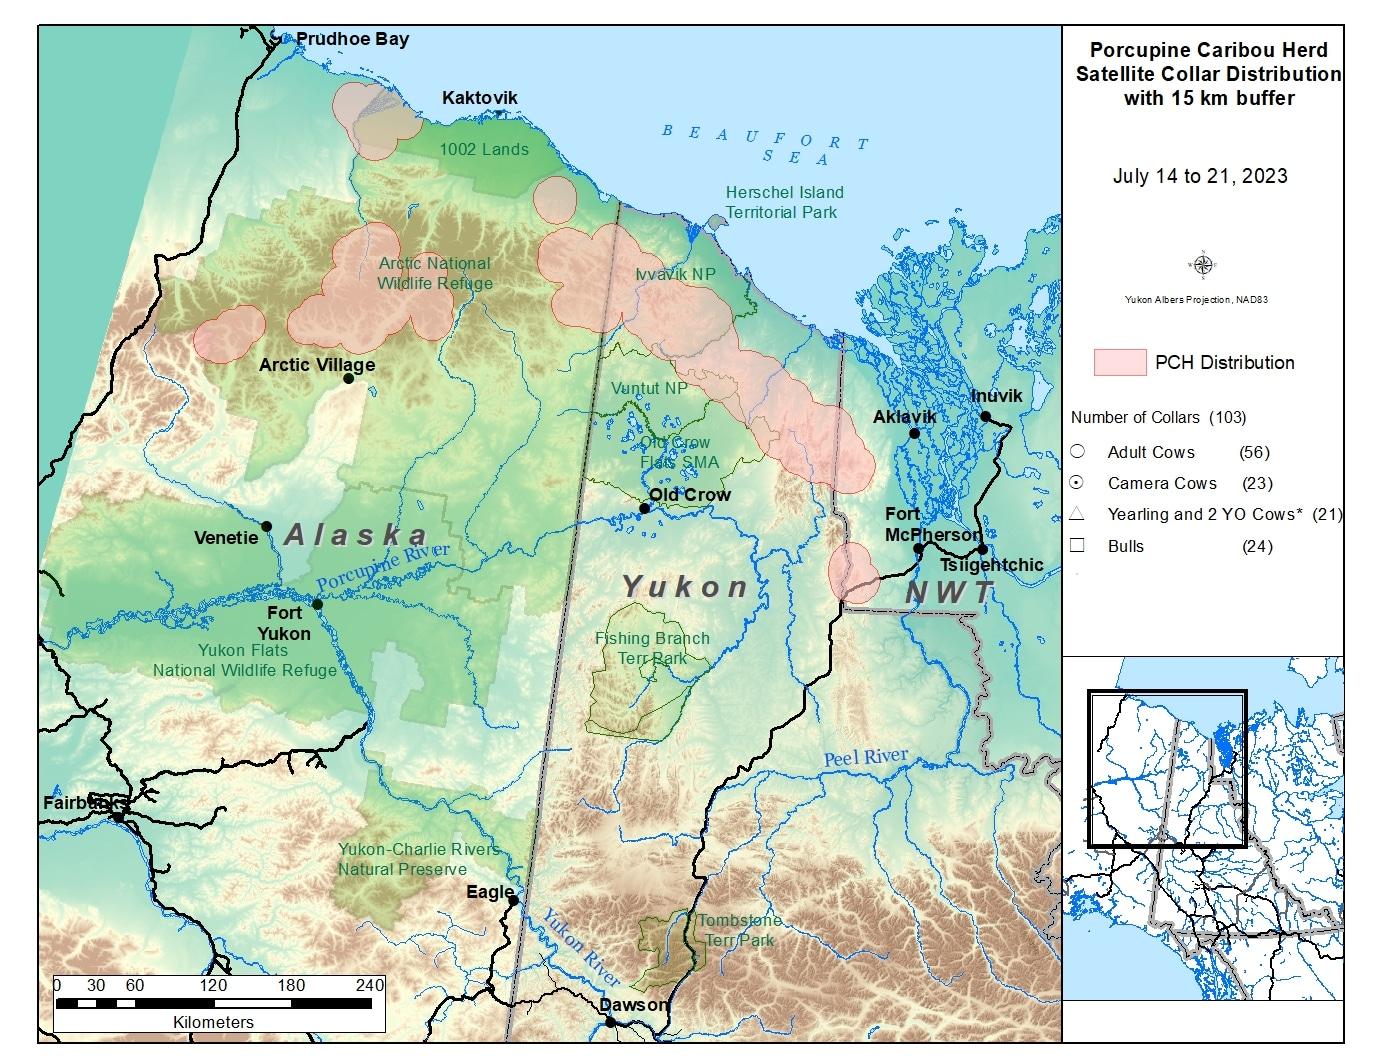 Porcupine Caribou collar map